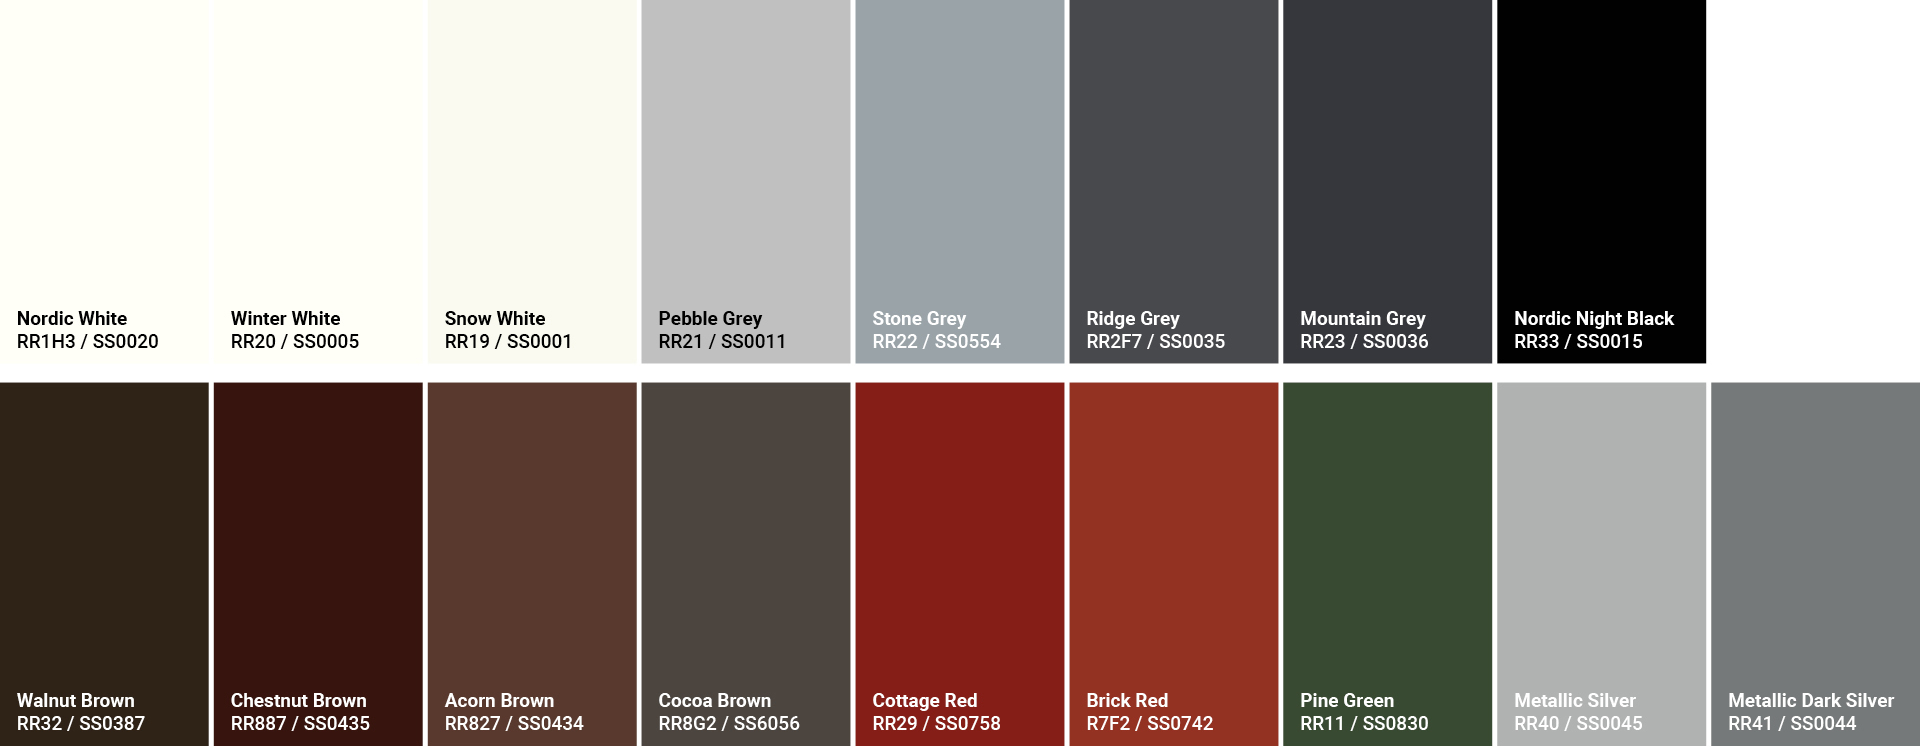 GreenCoat RWS Pro colors